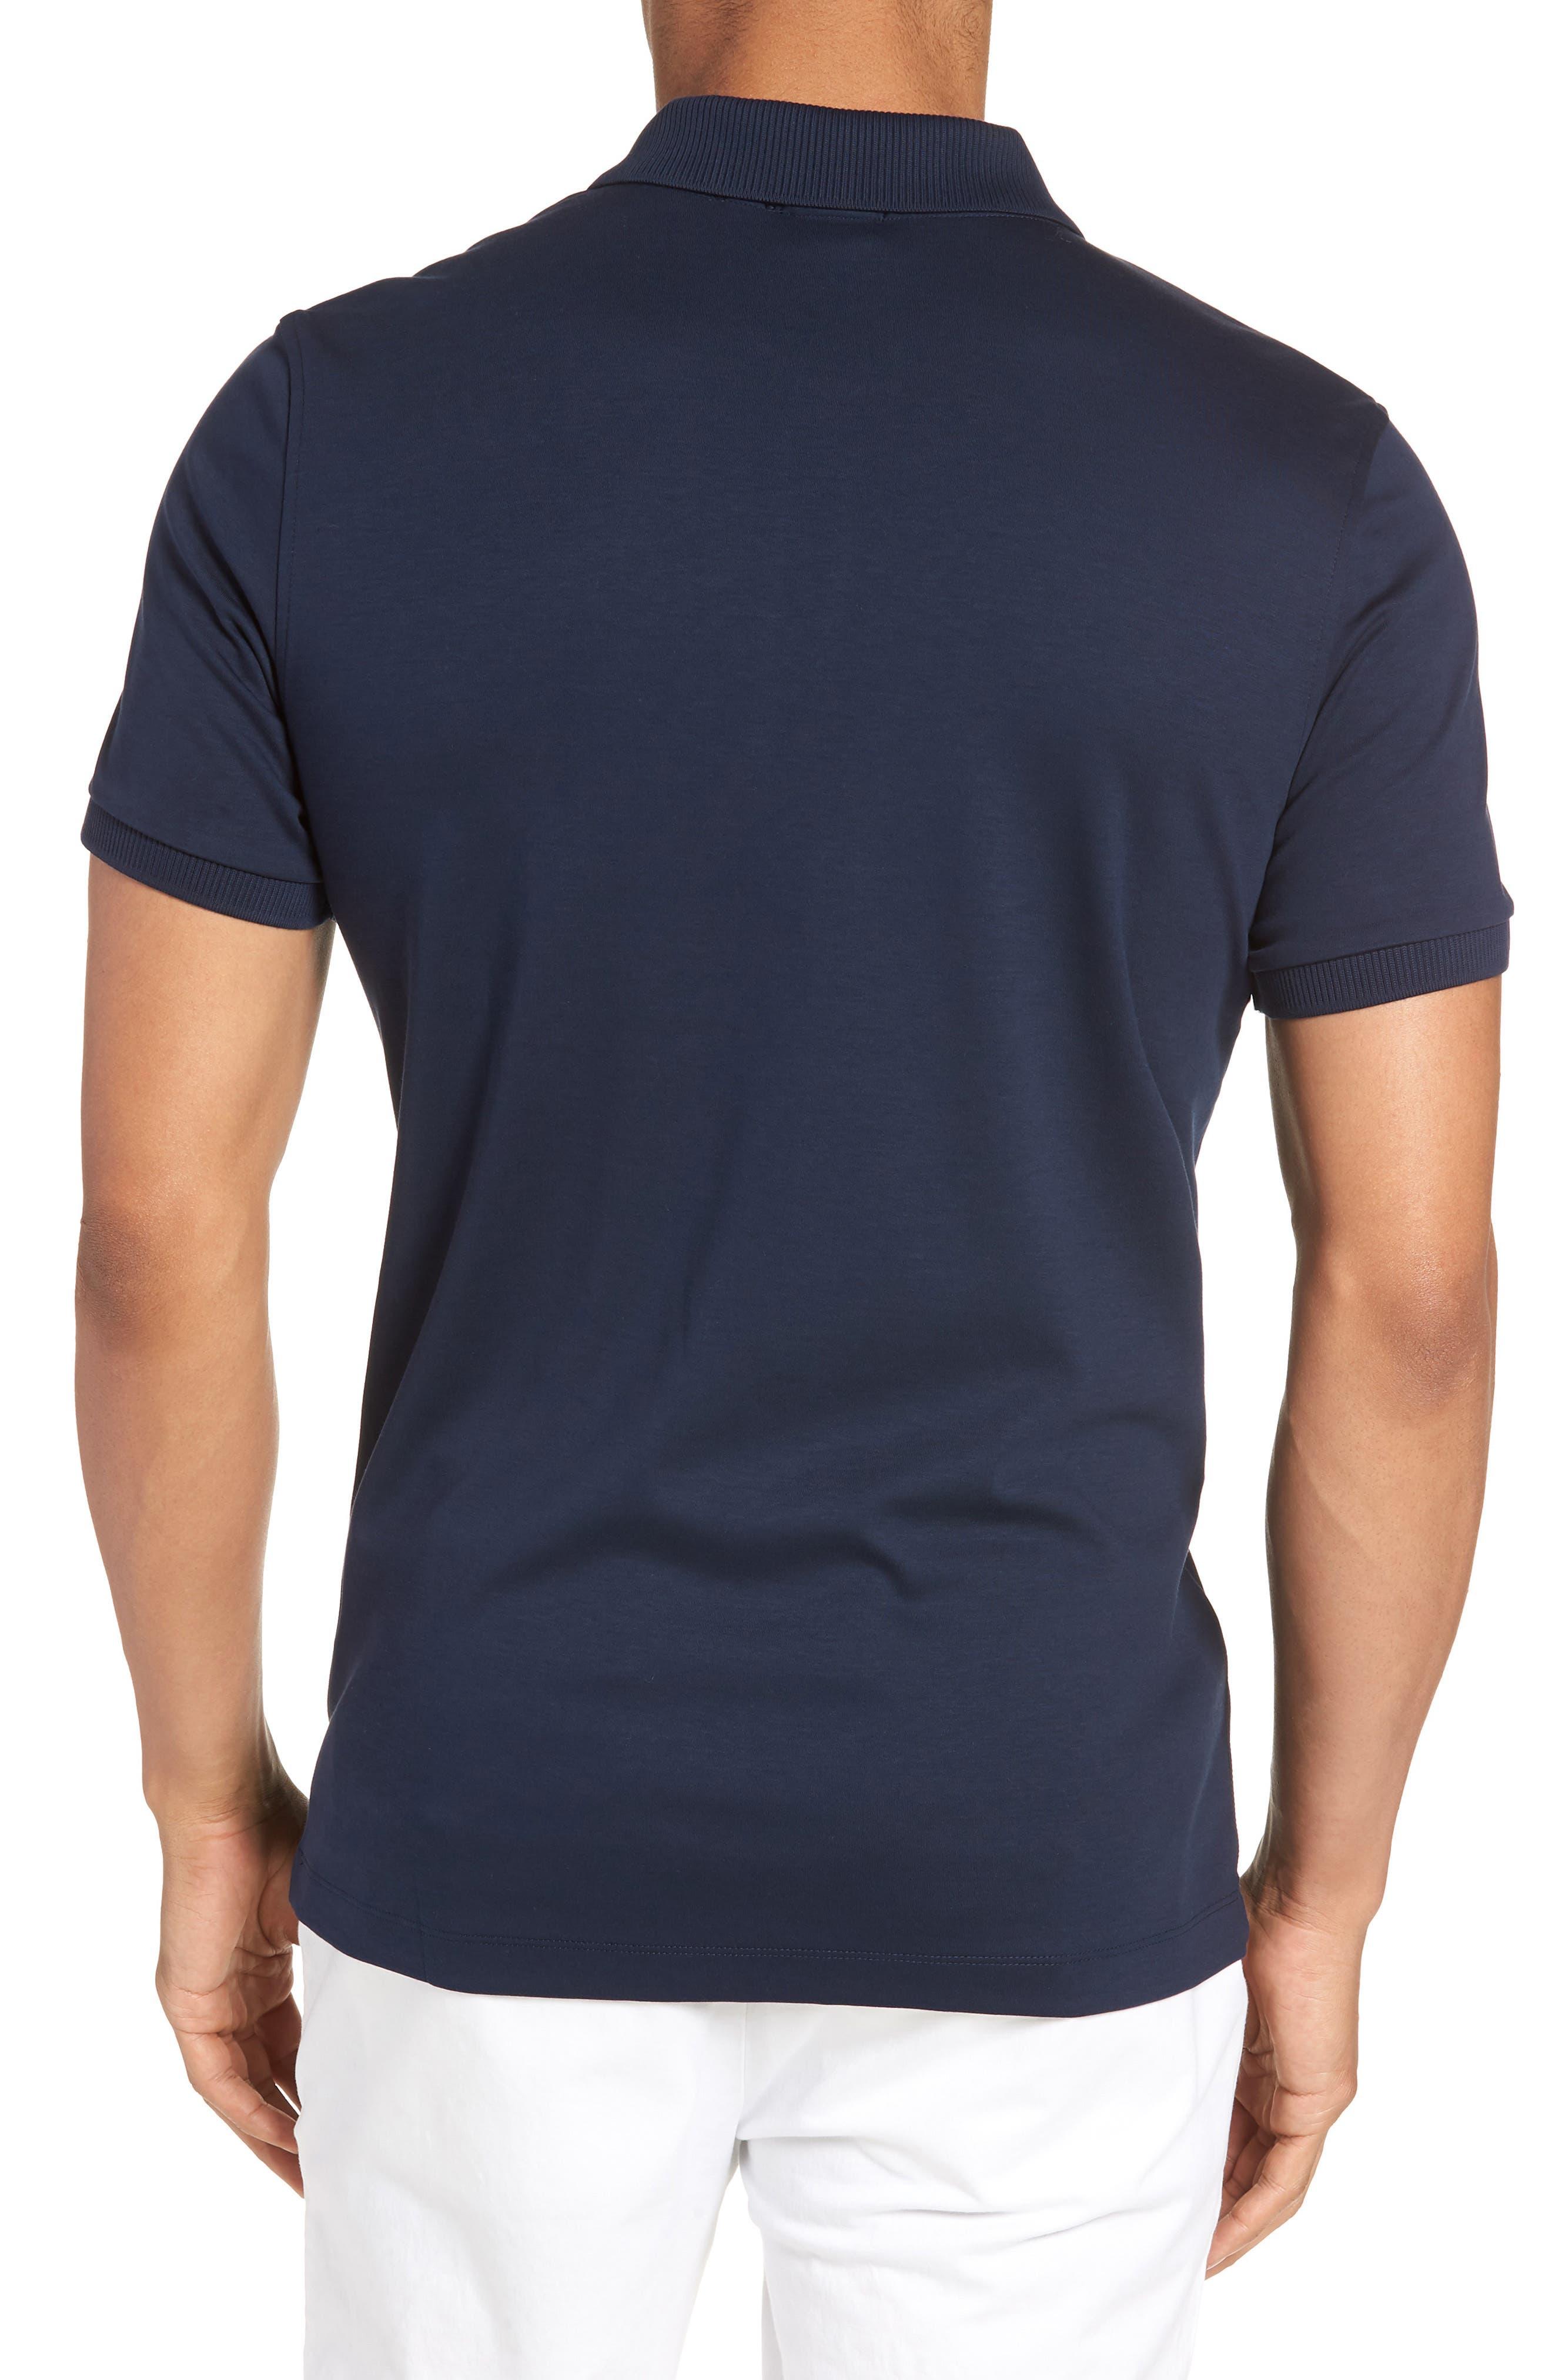 Pohl Polo Shirt,                             Alternate thumbnail 2, color,                             Blue